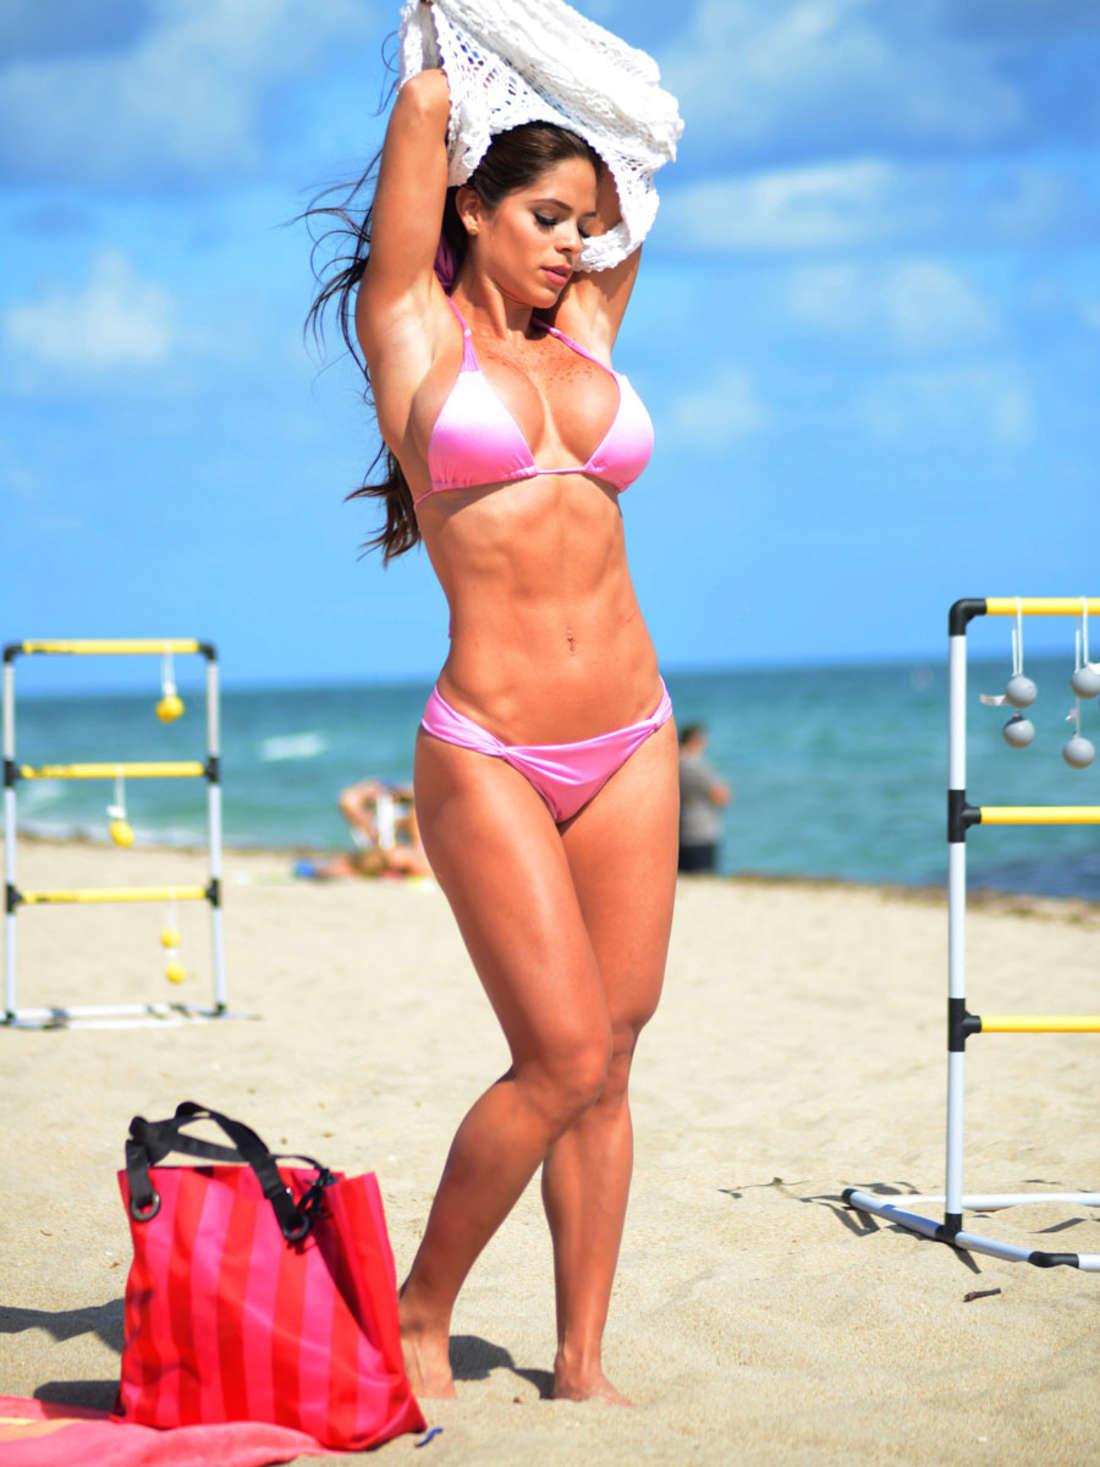 Cleavage Nathalie Fust nude (91 foto and video), Topless, Cleavage, Twitter, in bikini 2015